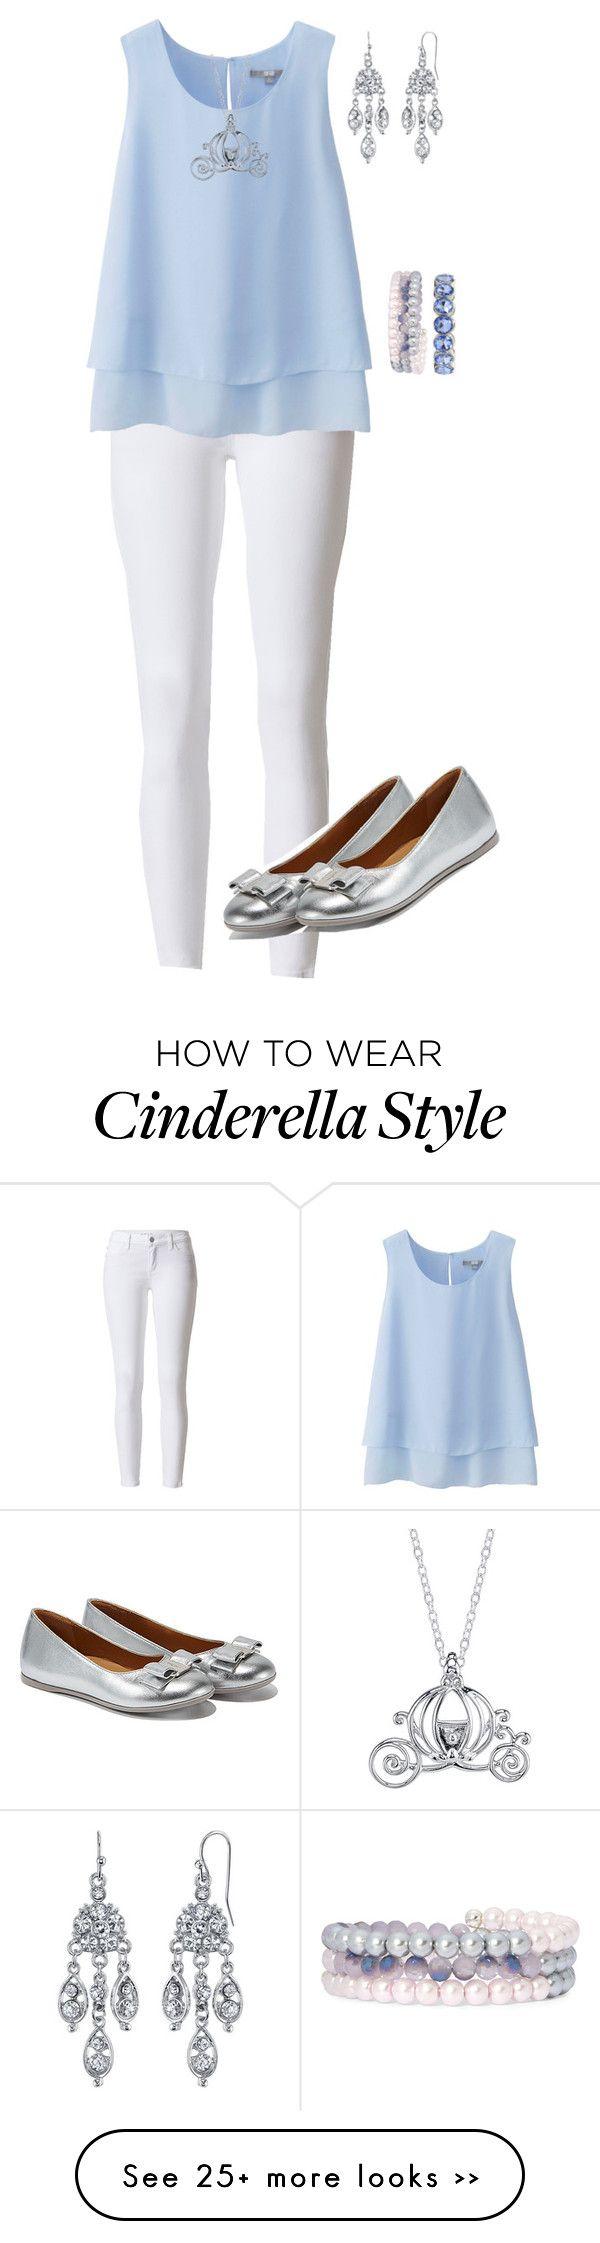 """Cinderella"" by jaggerbrooklyn on Polyvore"